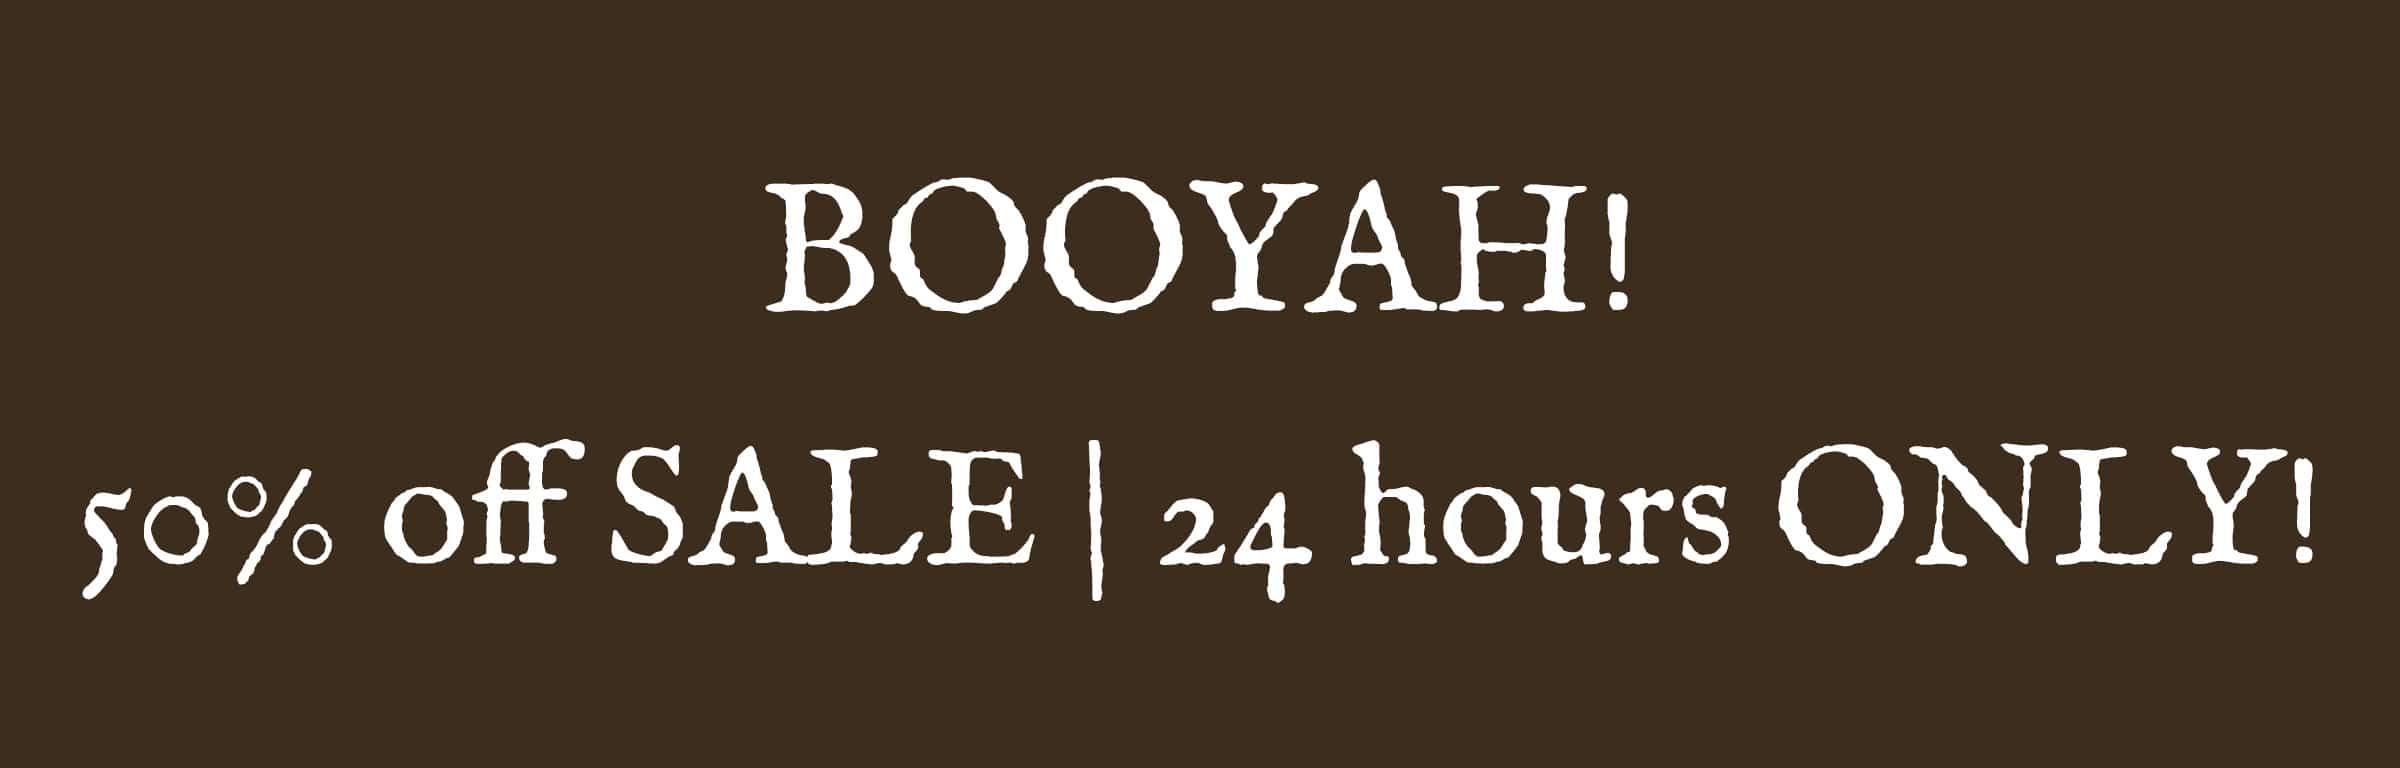 booyah sale